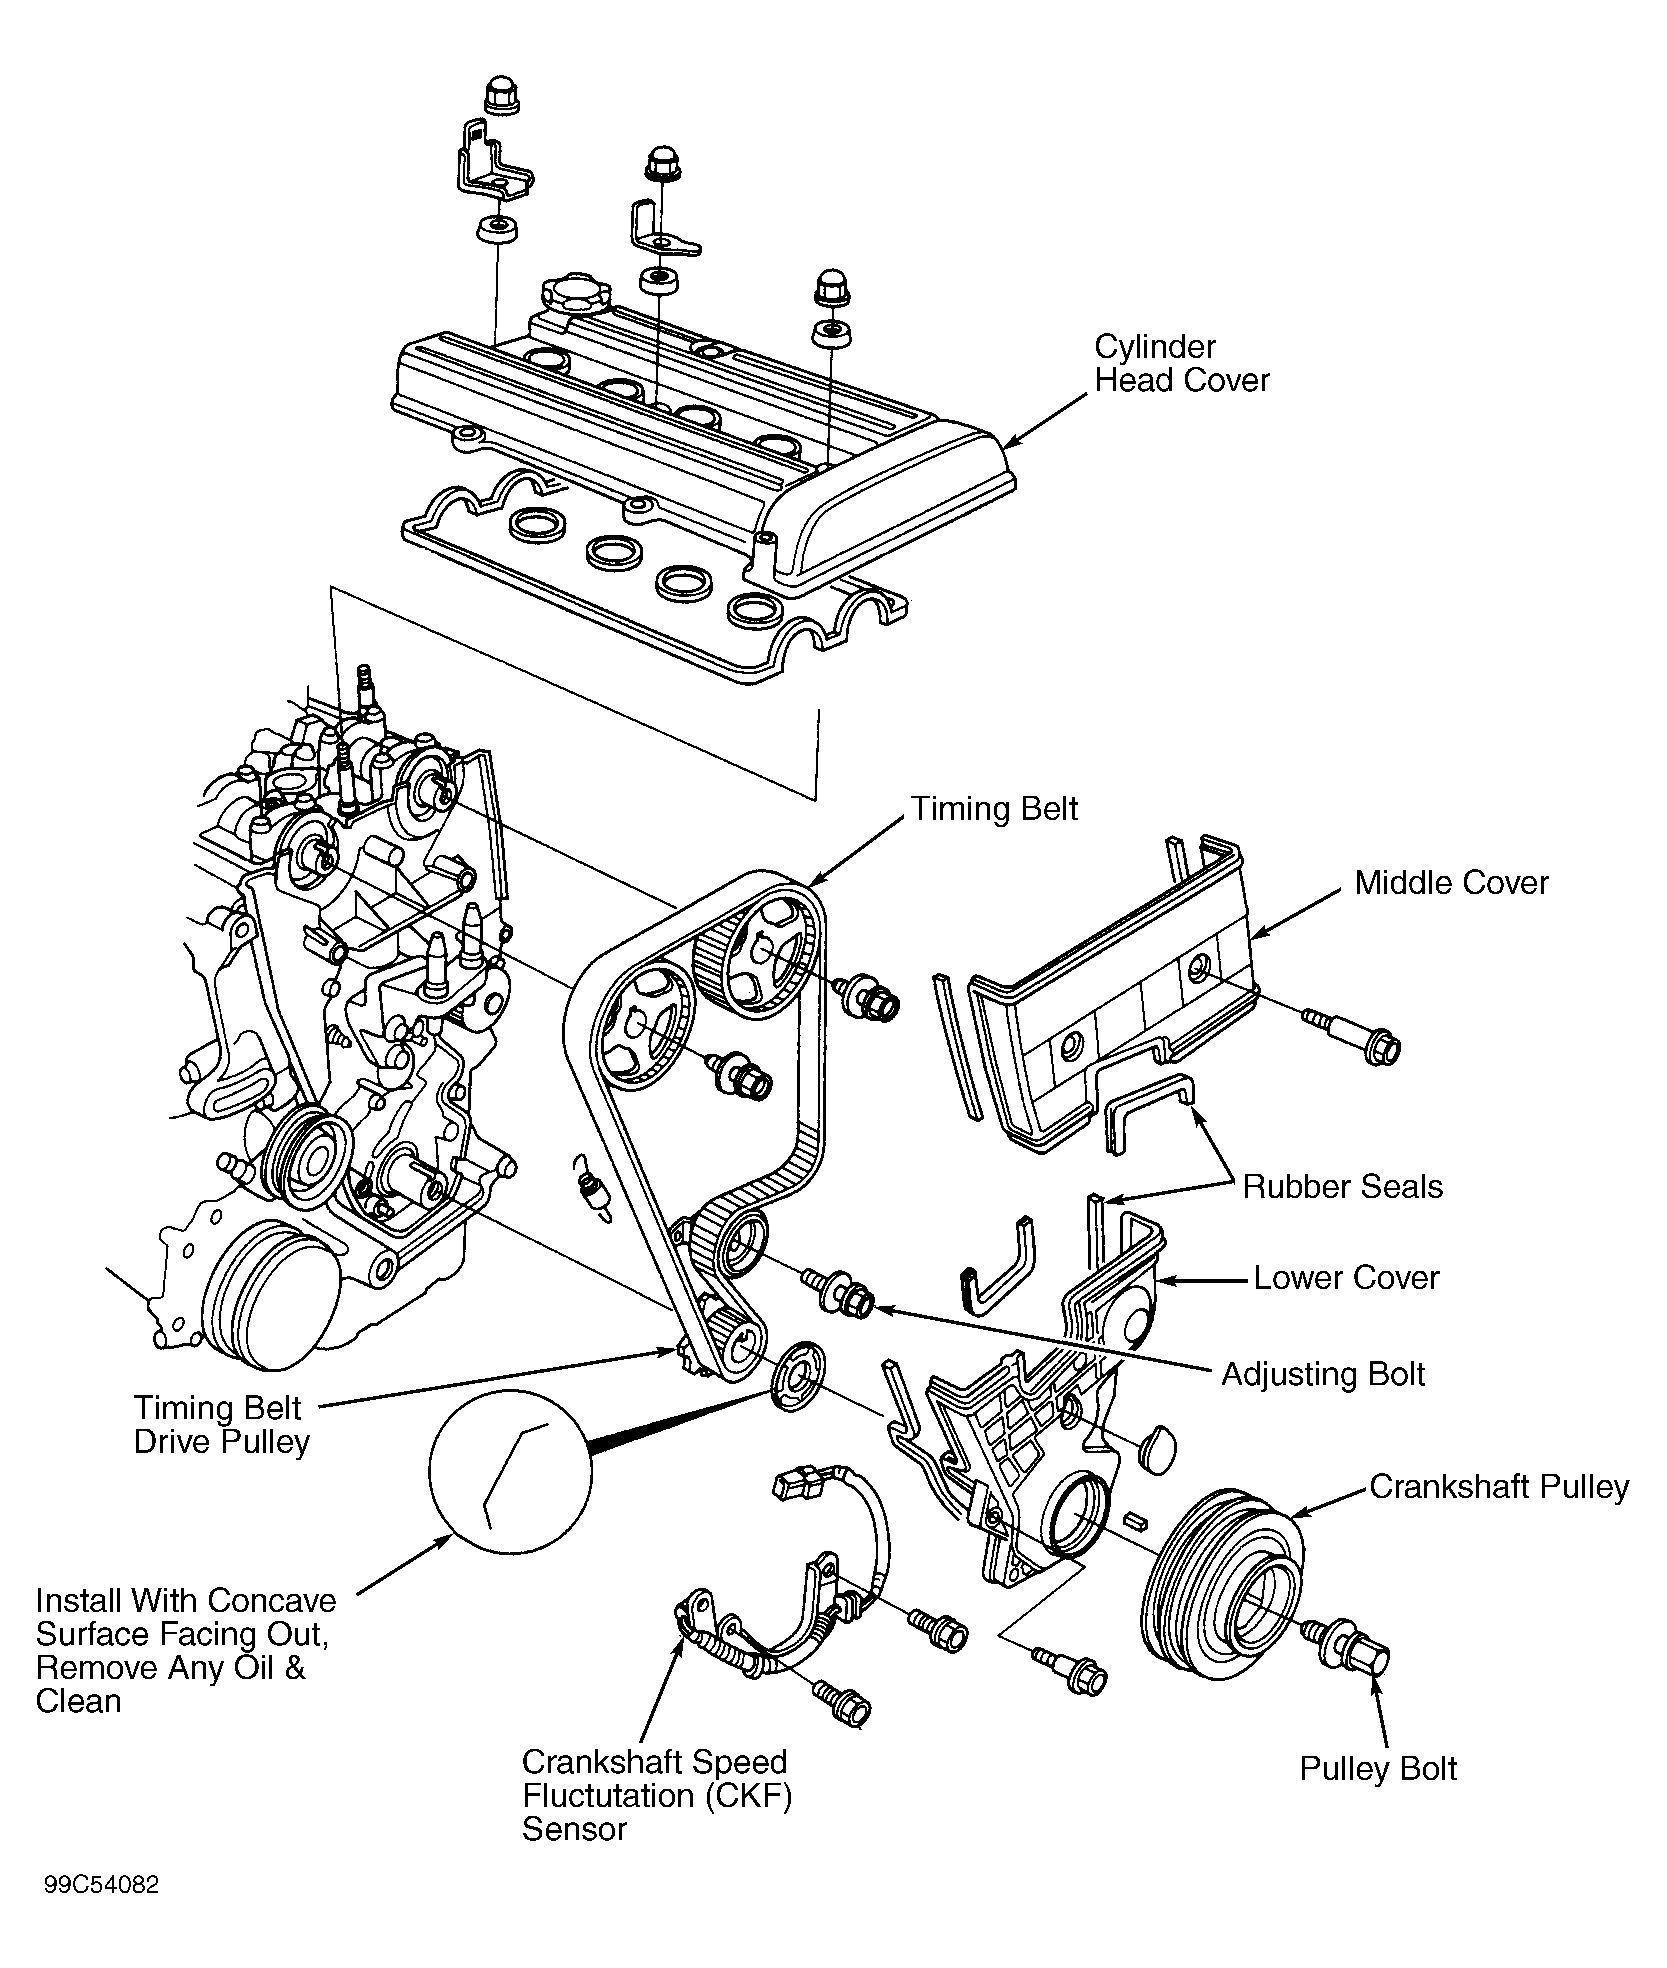 Honda Crv Engine Diagram Wiring Diagram 2003 Ford Excursion Engine Diagram 2003 Honda Crv Engine Diagram 4 Best Cheap Hotels In 2020 Honda Crv Ford Excursion Diagram